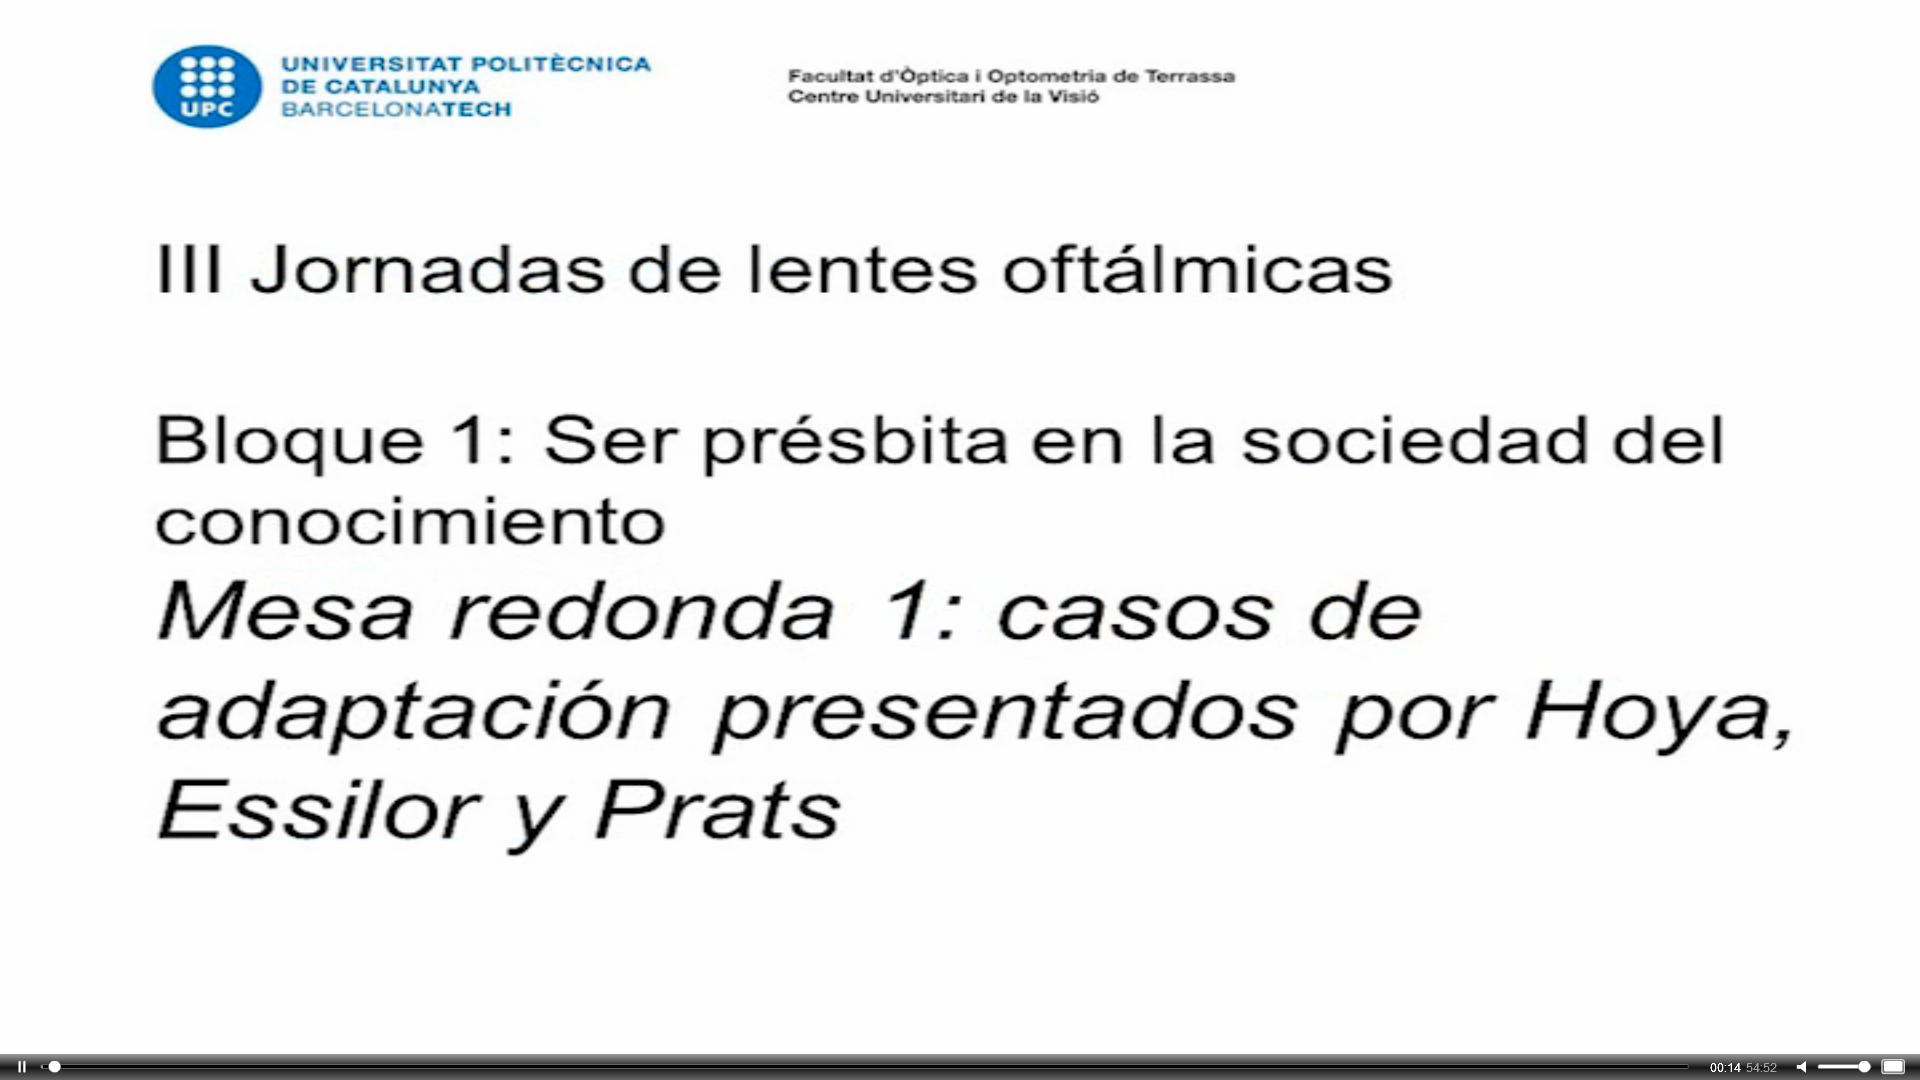 JLO2016_lentes_oftalmicas_mesa_redonda_1(Prats-Hoya_Essilor)